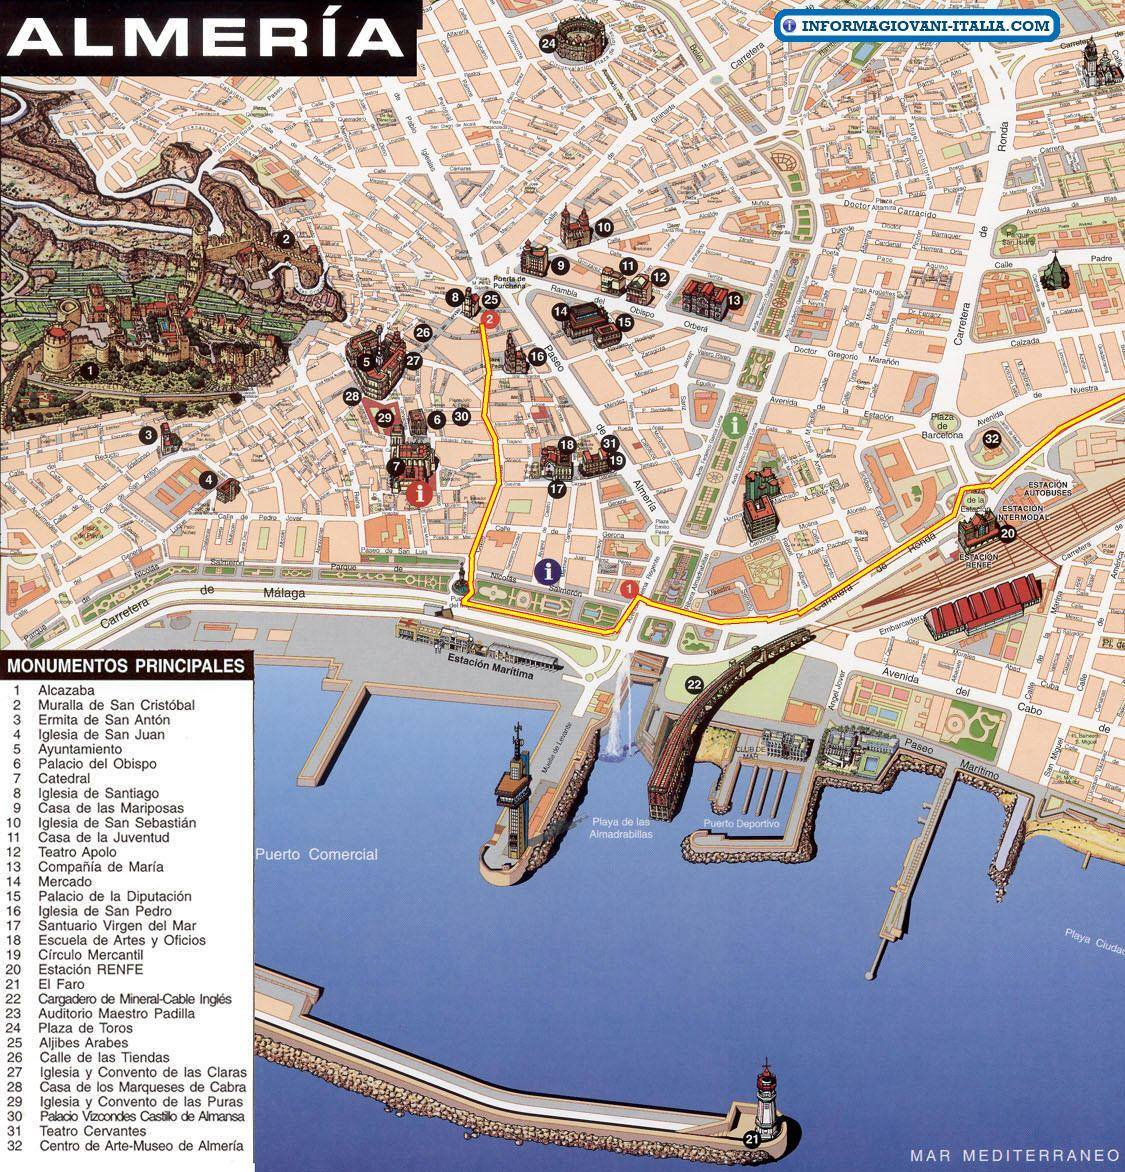 Map Of Spain Almeria.Almeria Spain Cruise Port Of Call